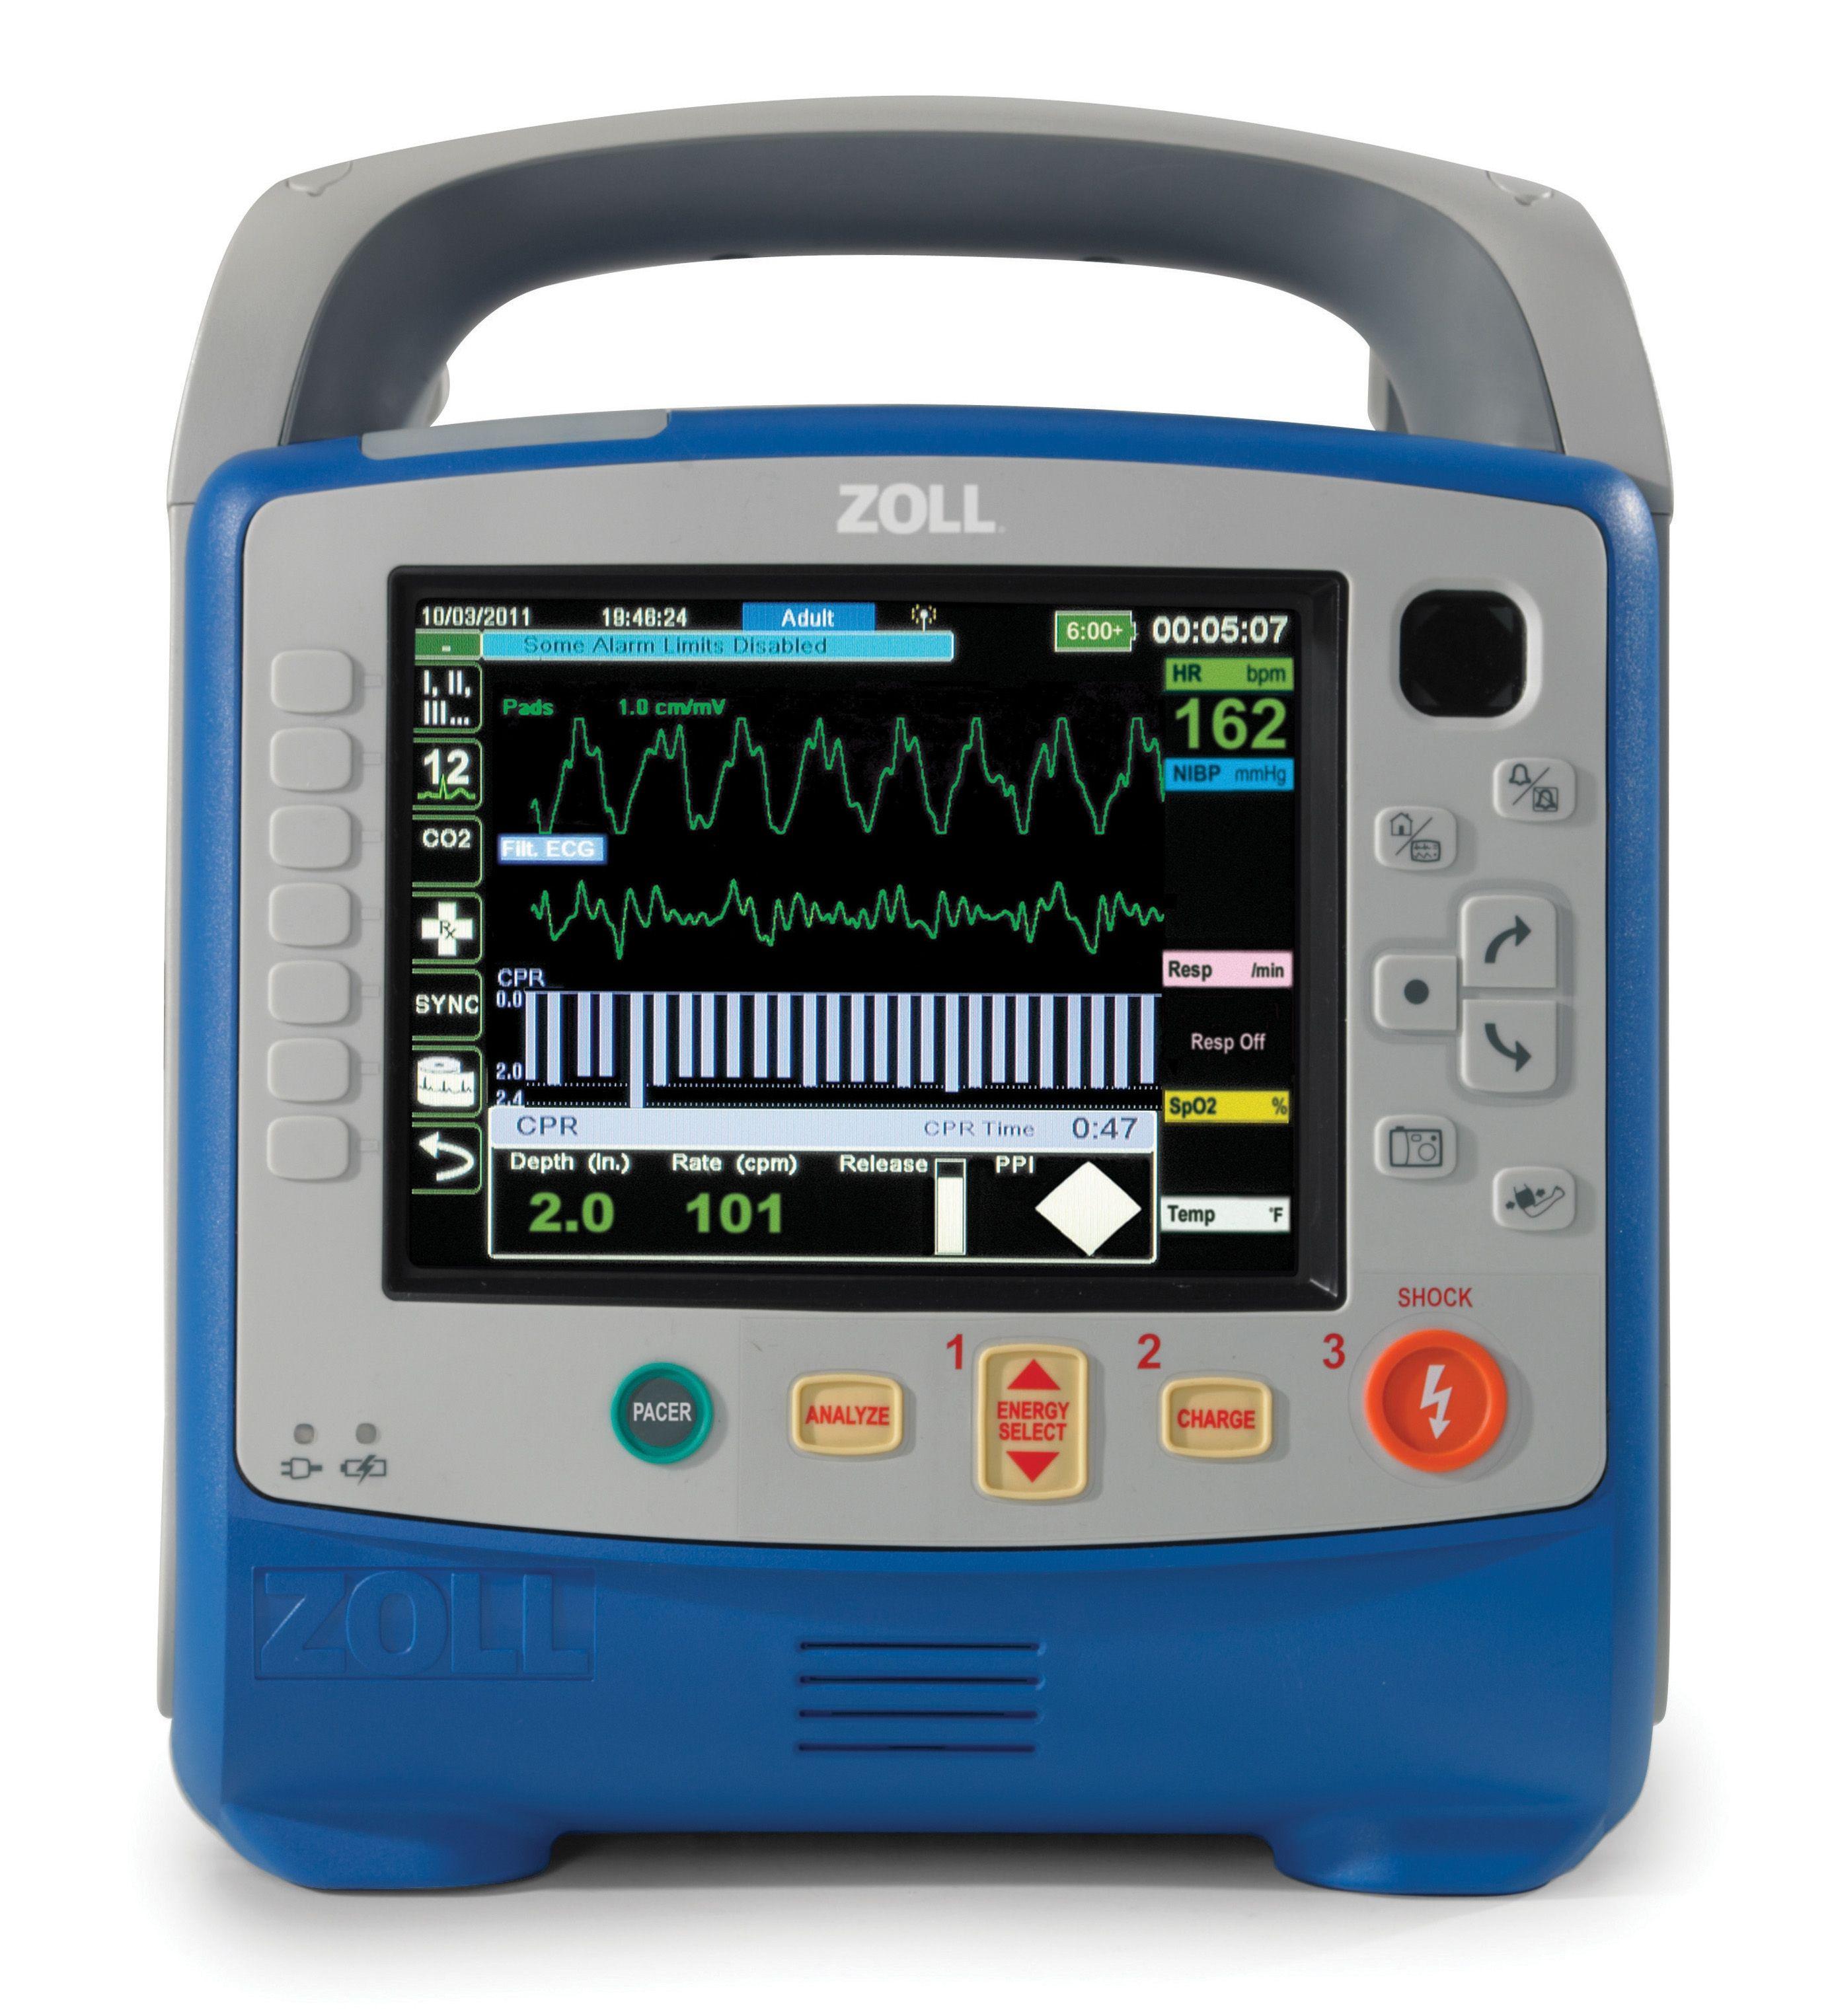 Zoll X Series Defibrillator Model Information